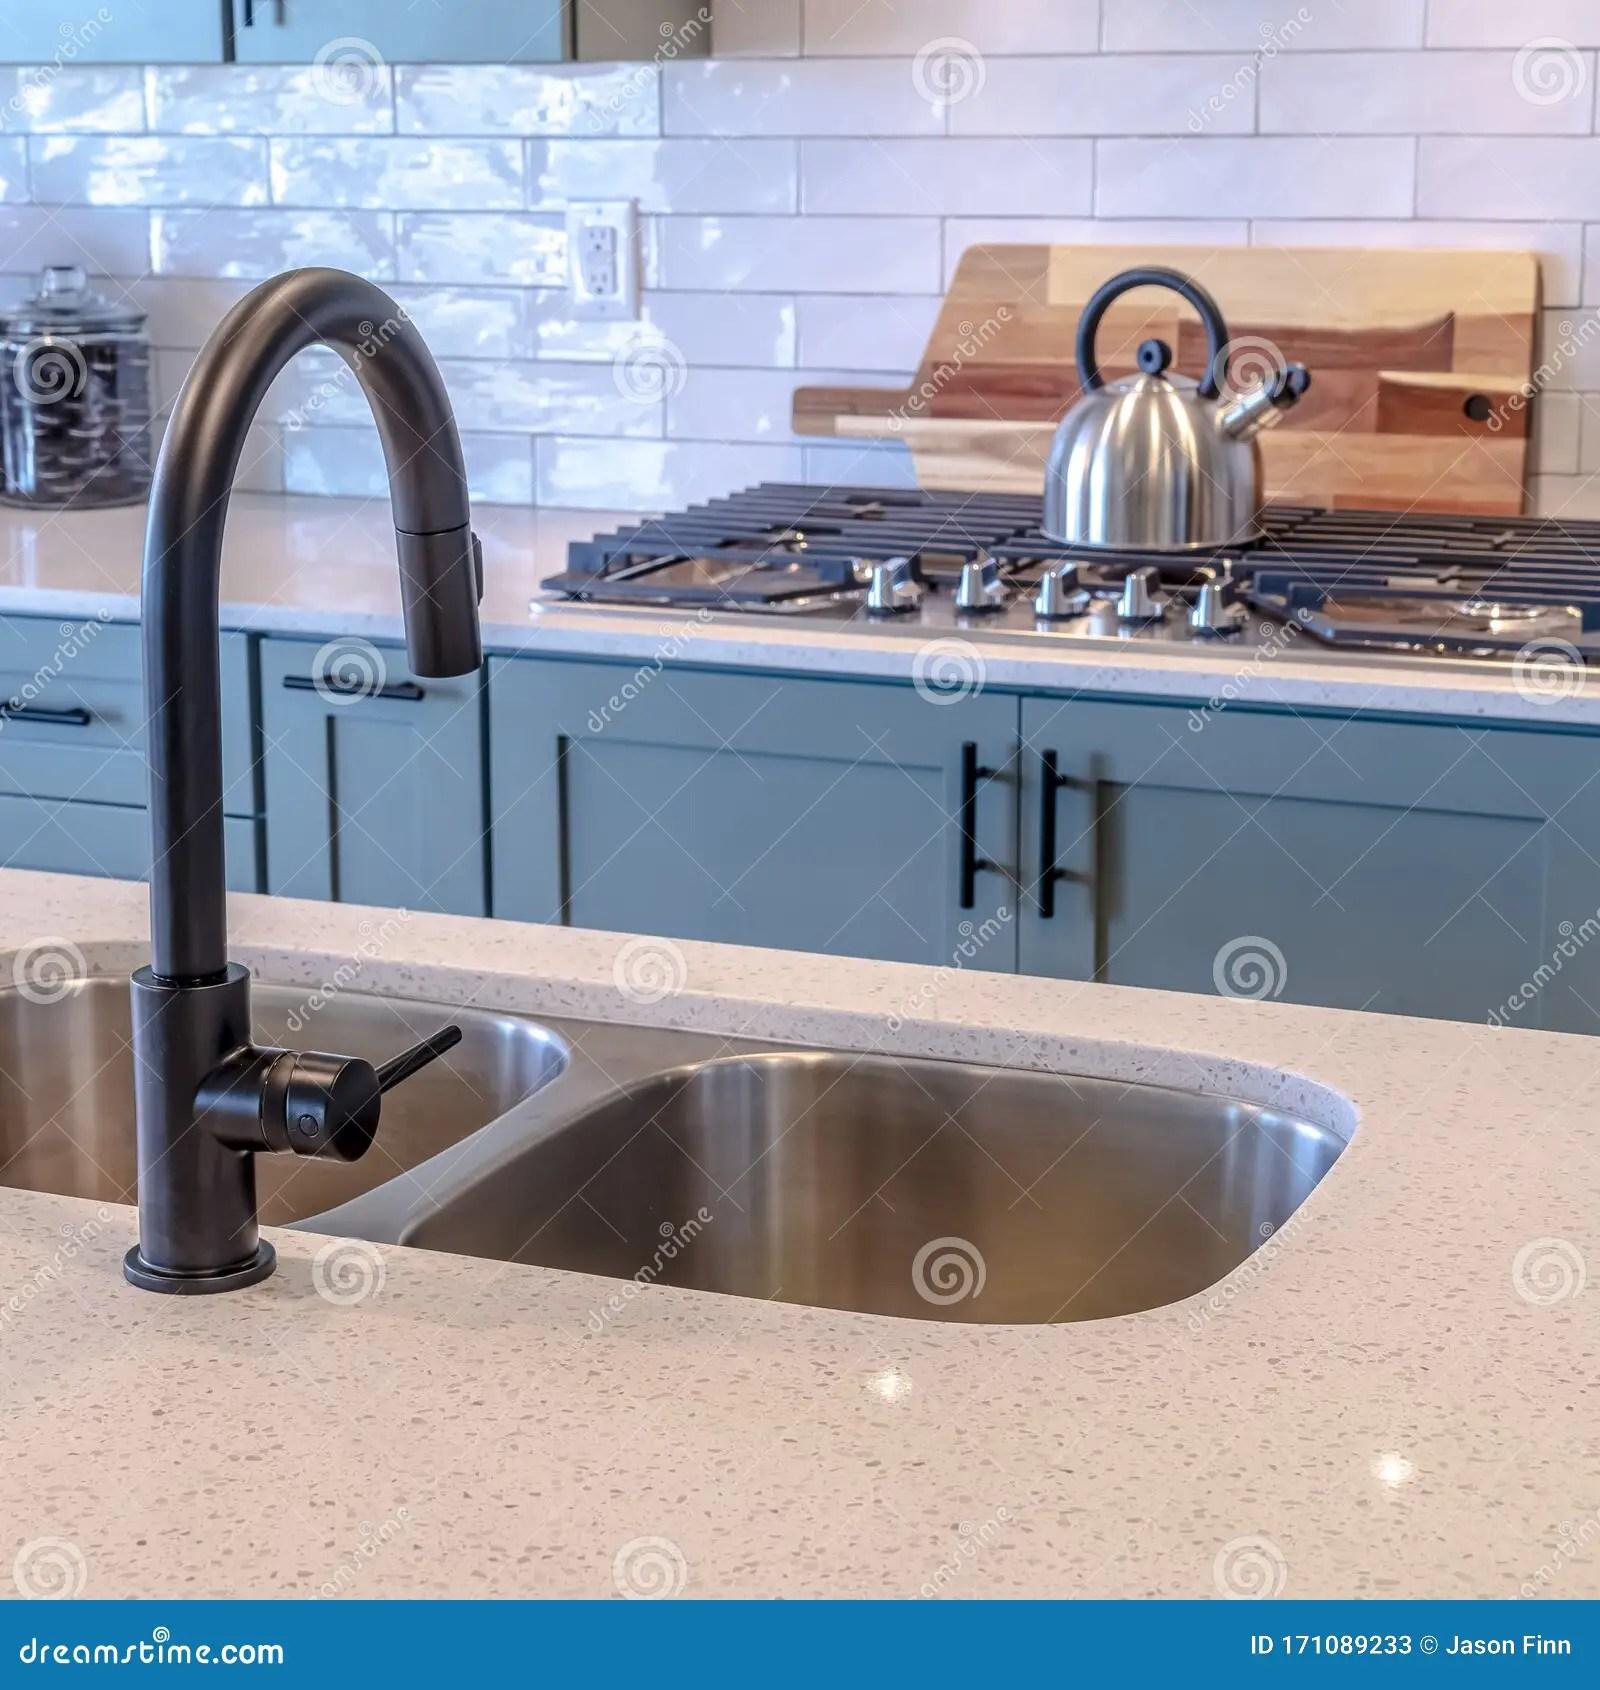 https www dreamstime com photo square frame kitchen island double sink black faucet against cooktop tile backsplash wooden cabinets handles can image171089233